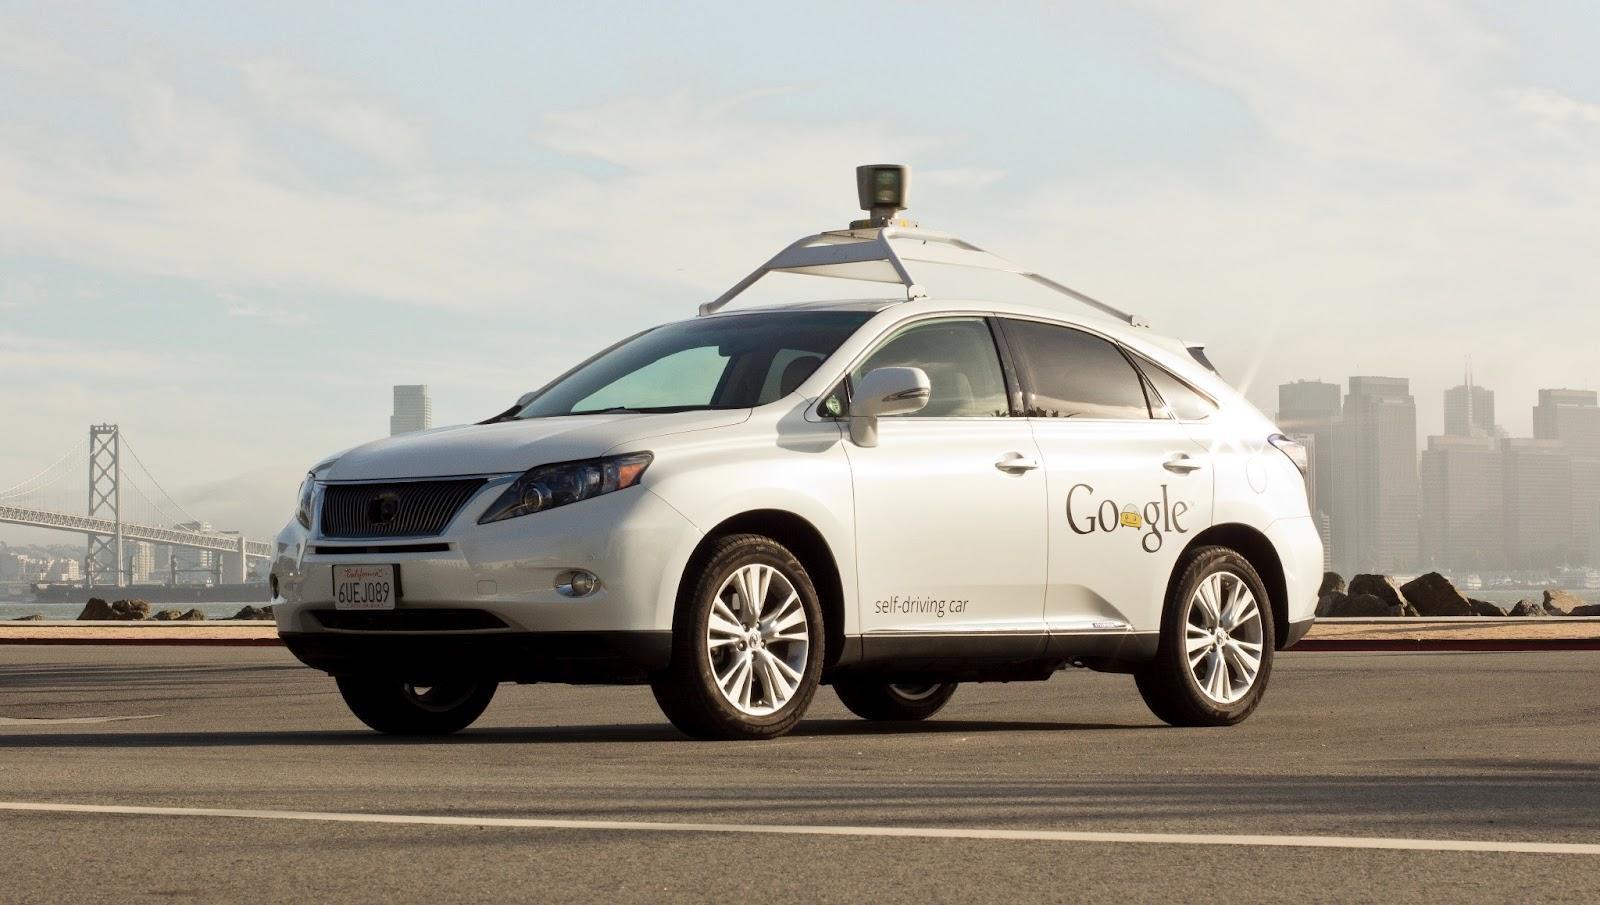 lexus-rx450h-self-driving-car.jpeg